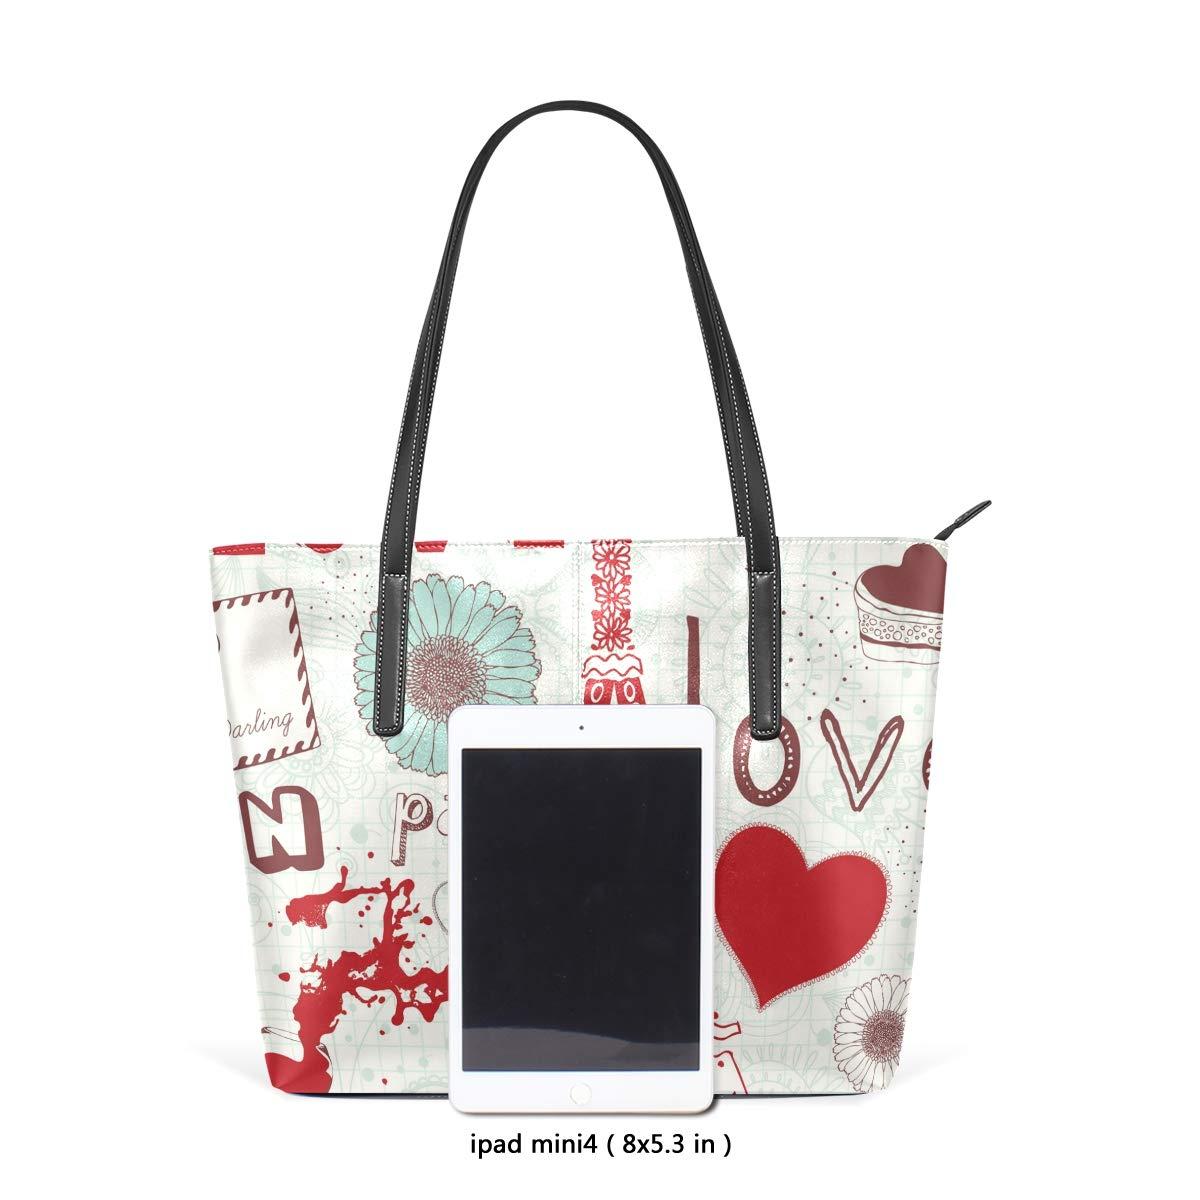 Beautiful Japanese Mount Fuji Landscape Illustration Womens PU Leather Tote Shoulder Bags Handbags Casual Bag